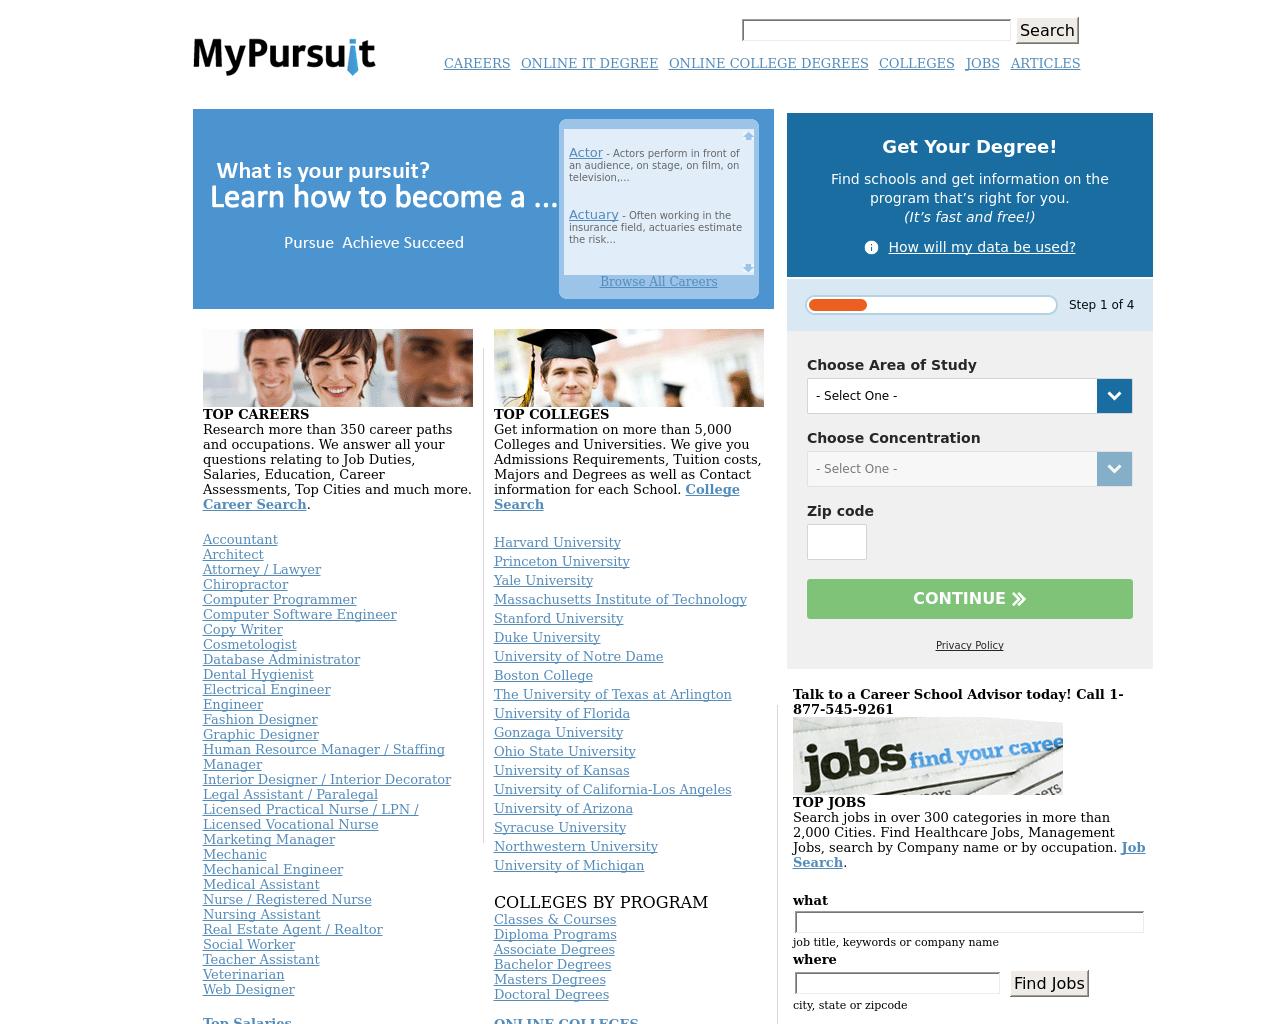 MyPursuit-Advertising-Reviews-Pricing